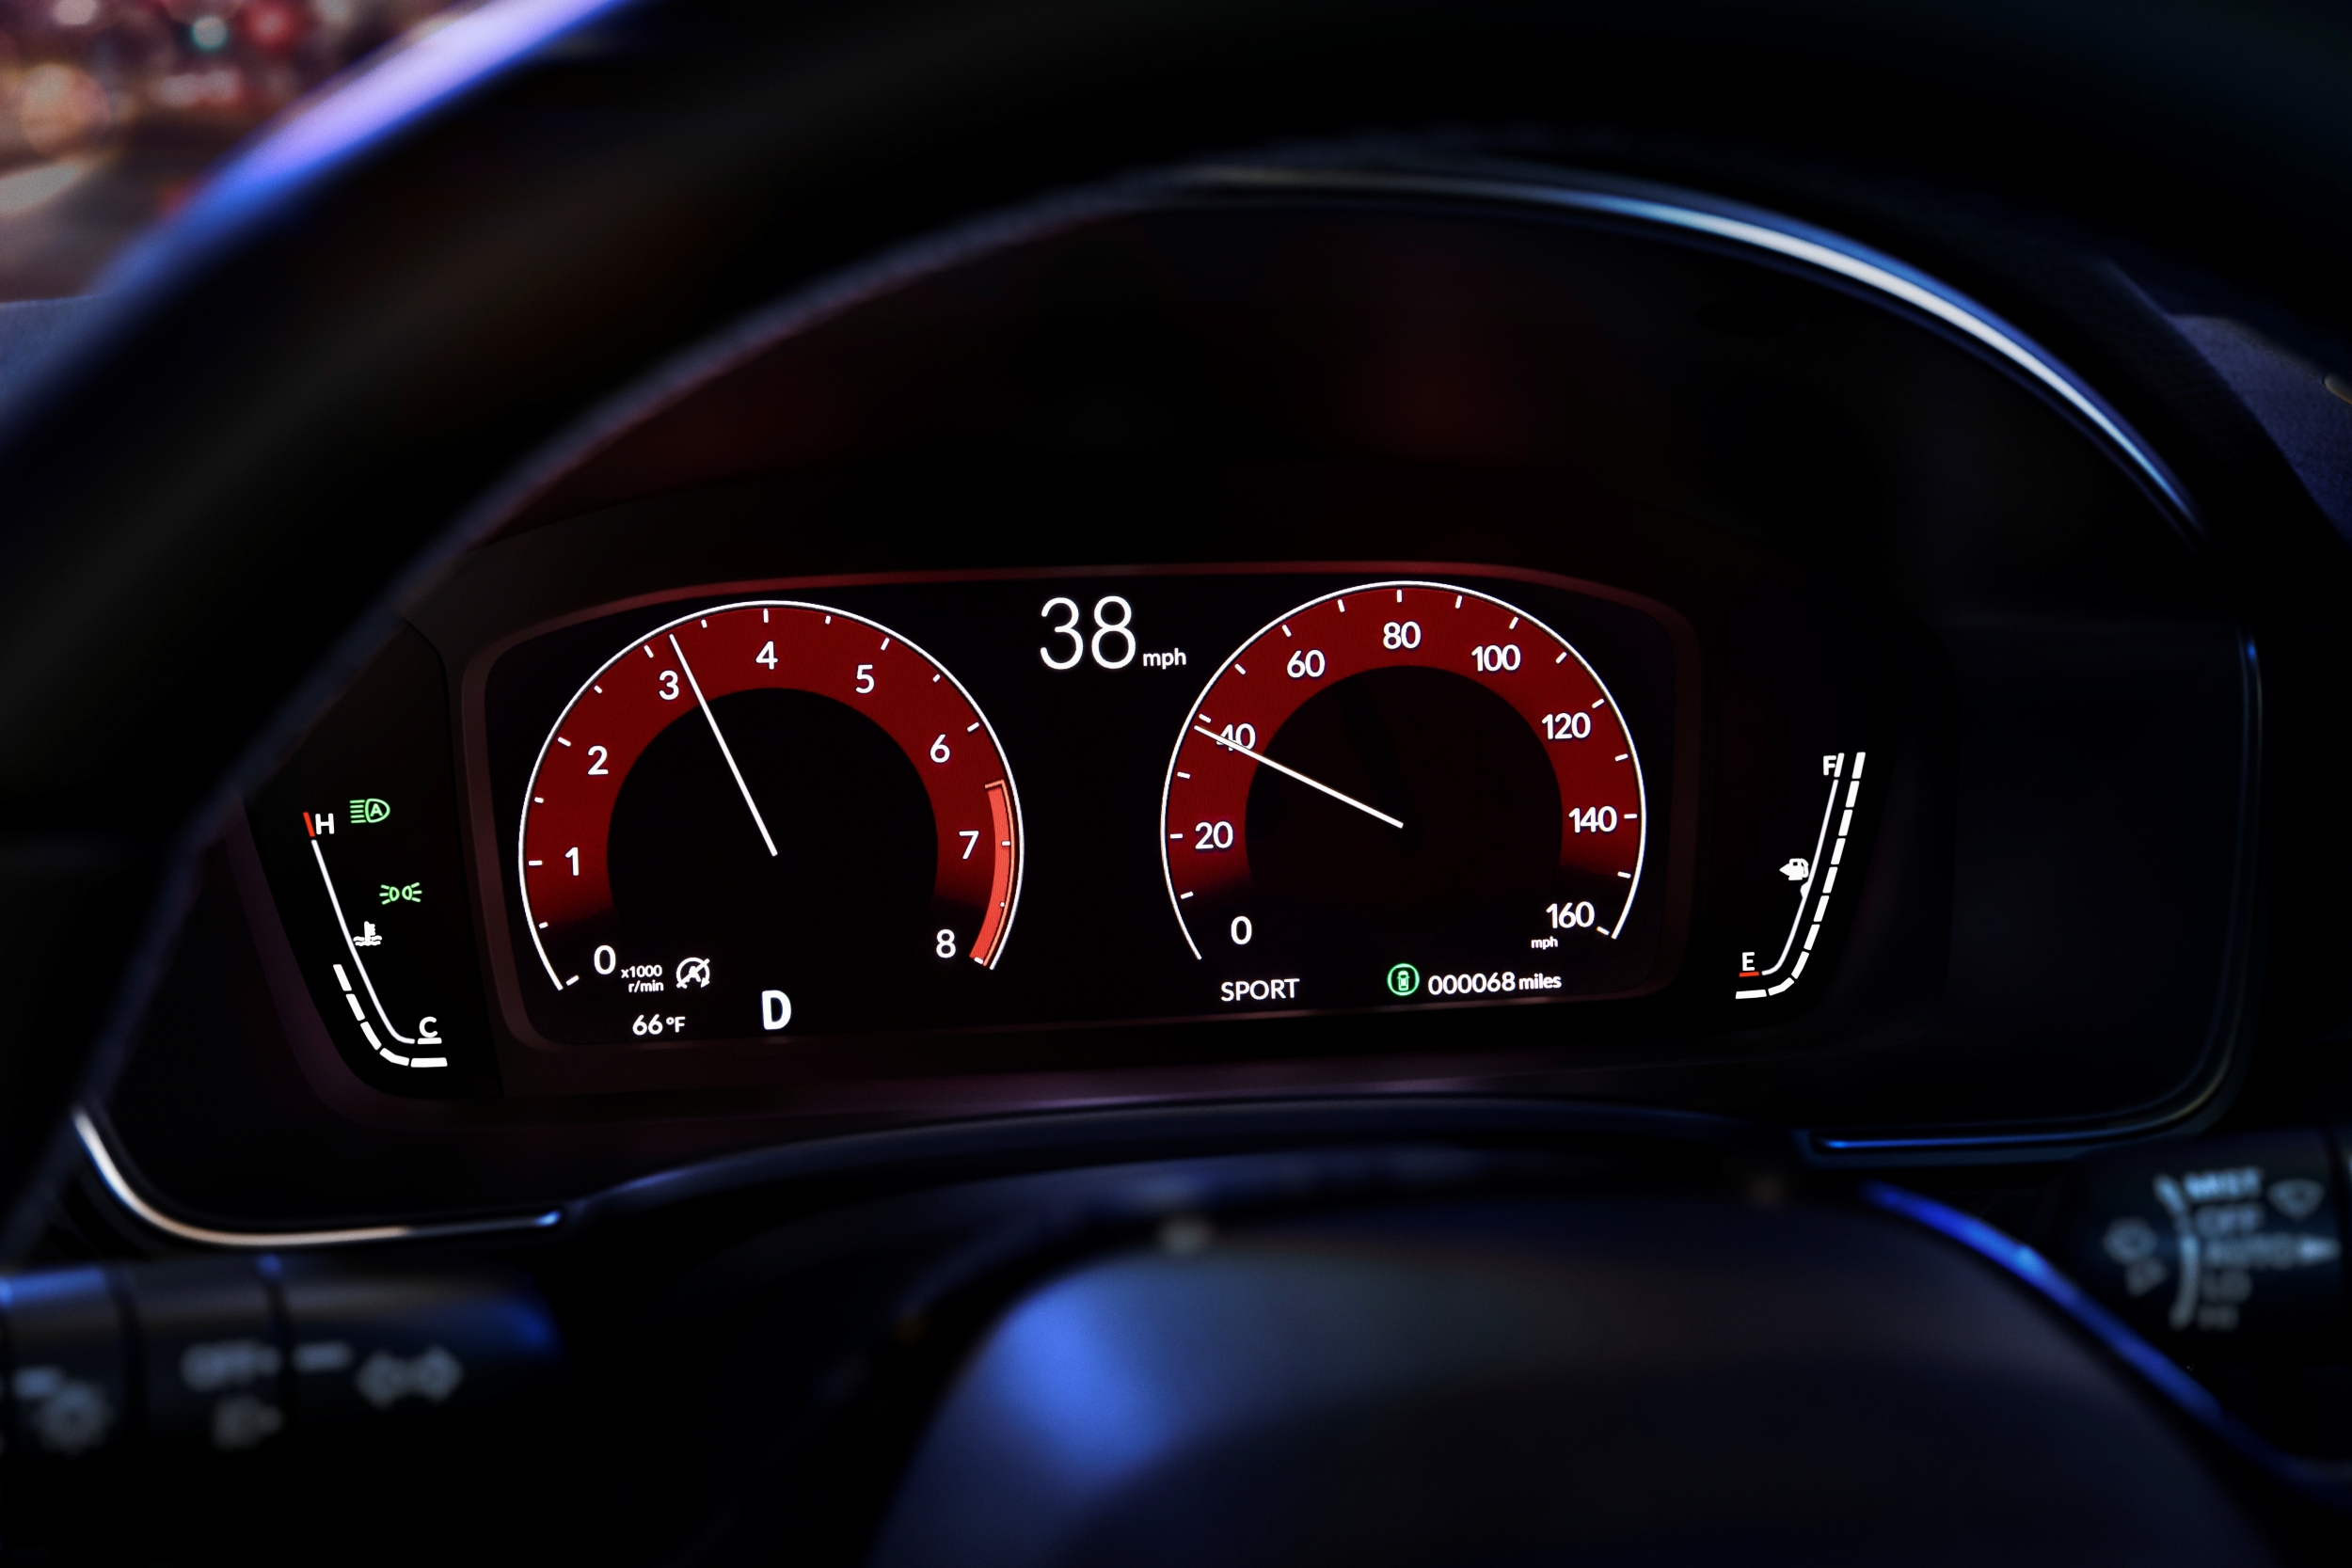 new Honda Civic 2022 AutoinfoOnline (18)